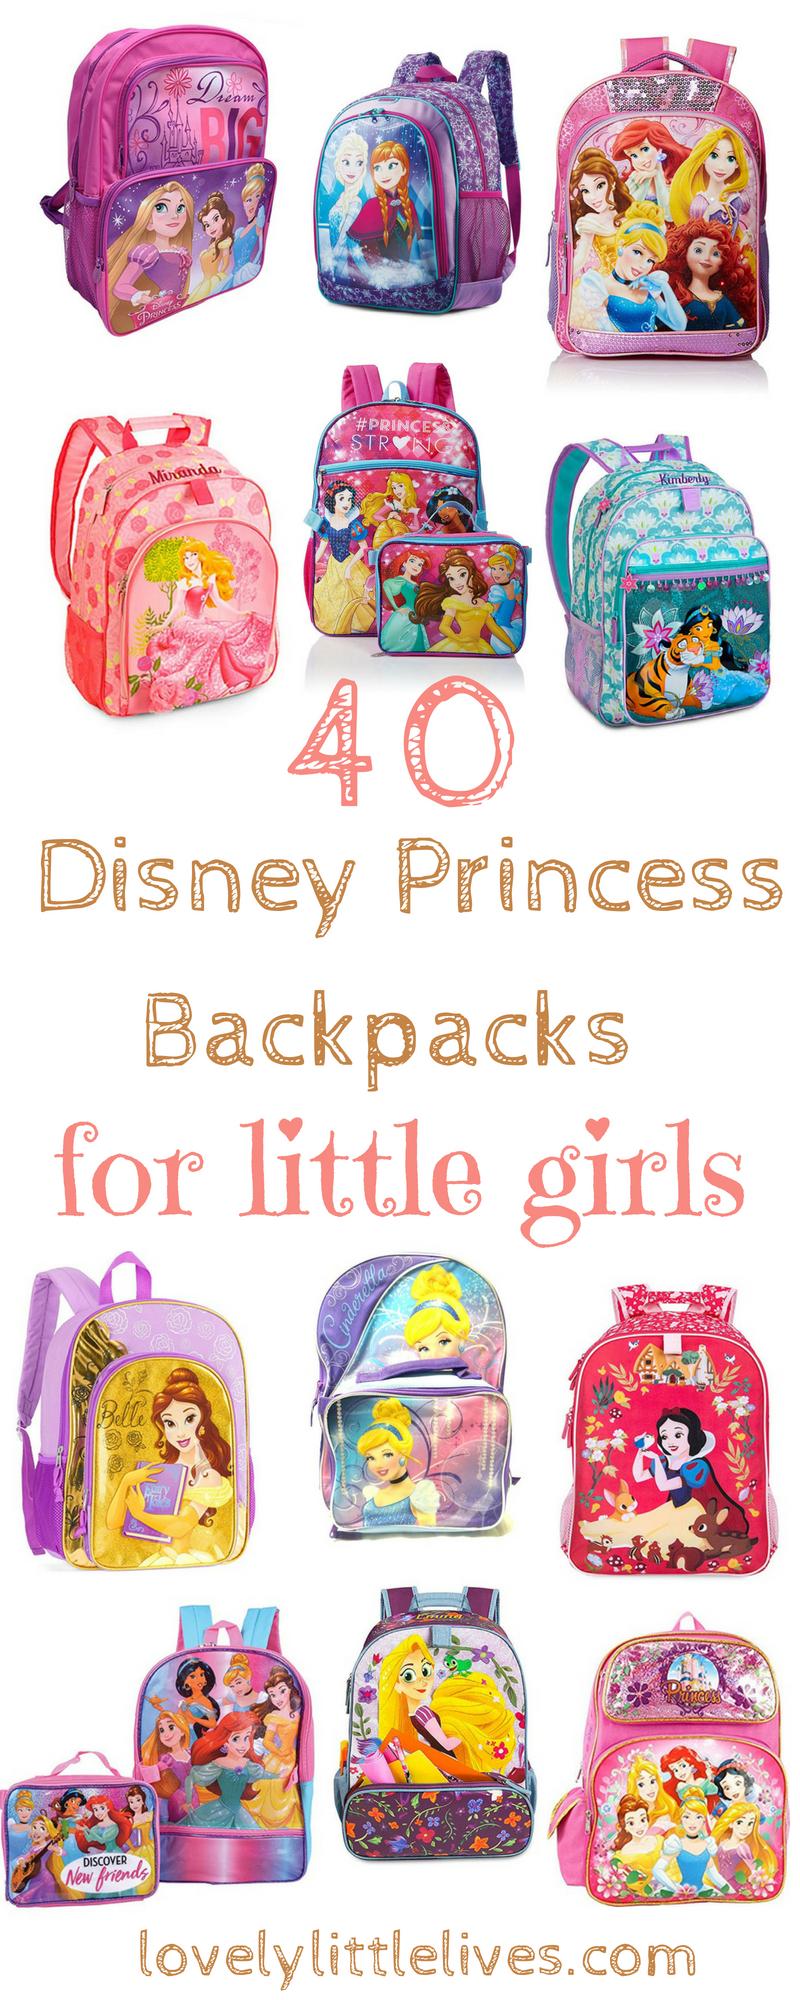 40 Disney Princess Backpacks for Little Girls on Amazon #backtoschoolshopping #amazonshopping #disneyprincess #disneyprincessbackpacks #backpacksforgirls